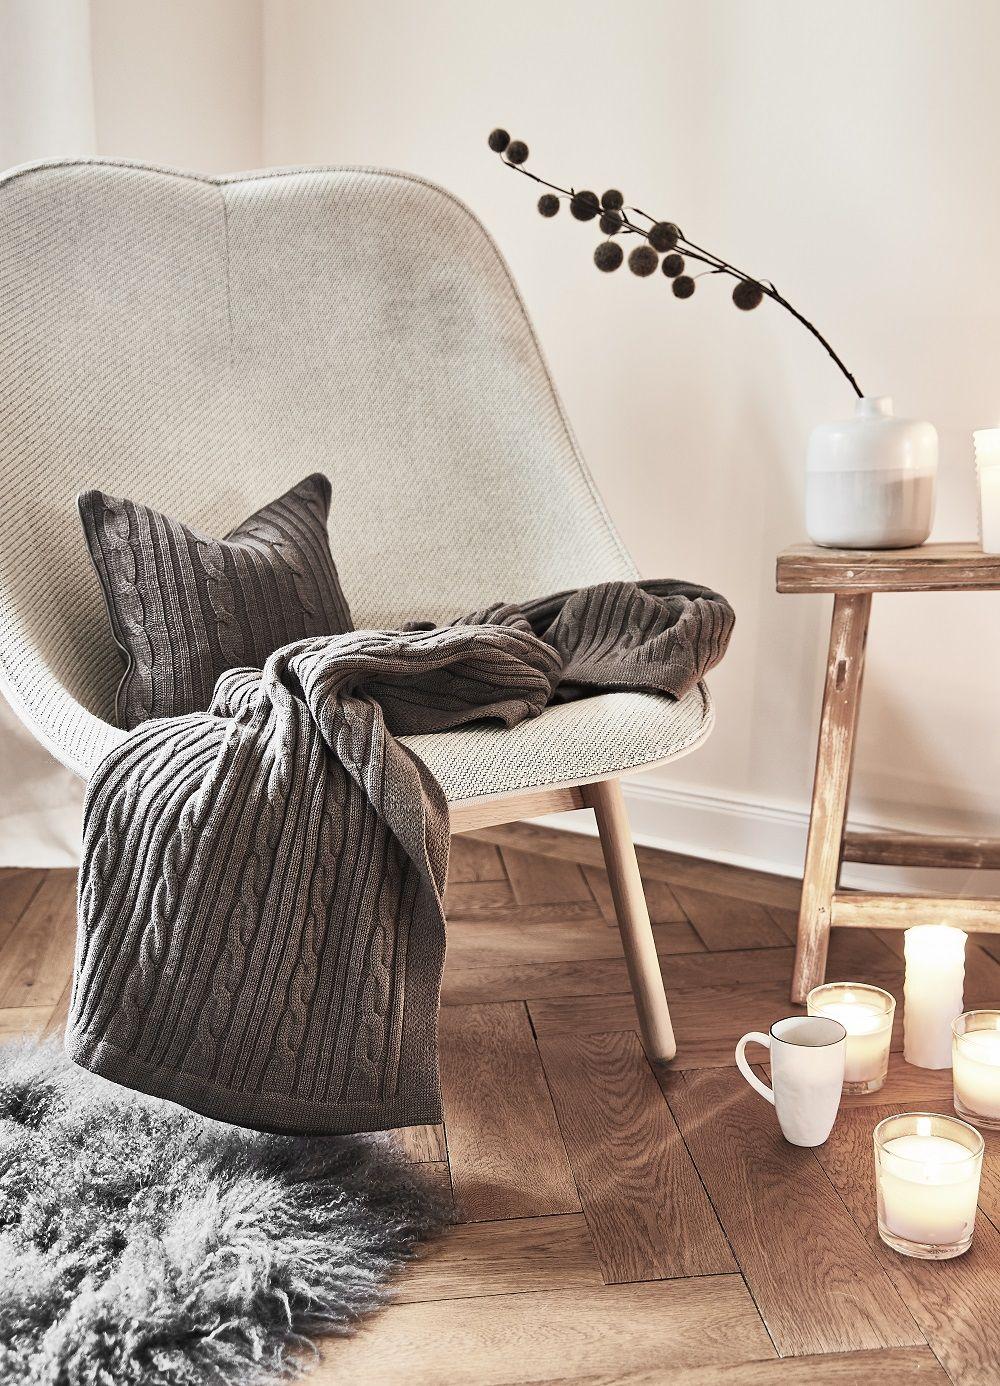 stuhl fell grau excellent full size of nahen filz stuhl stuhlkissen fellimitat sitzkissen. Black Bedroom Furniture Sets. Home Design Ideas